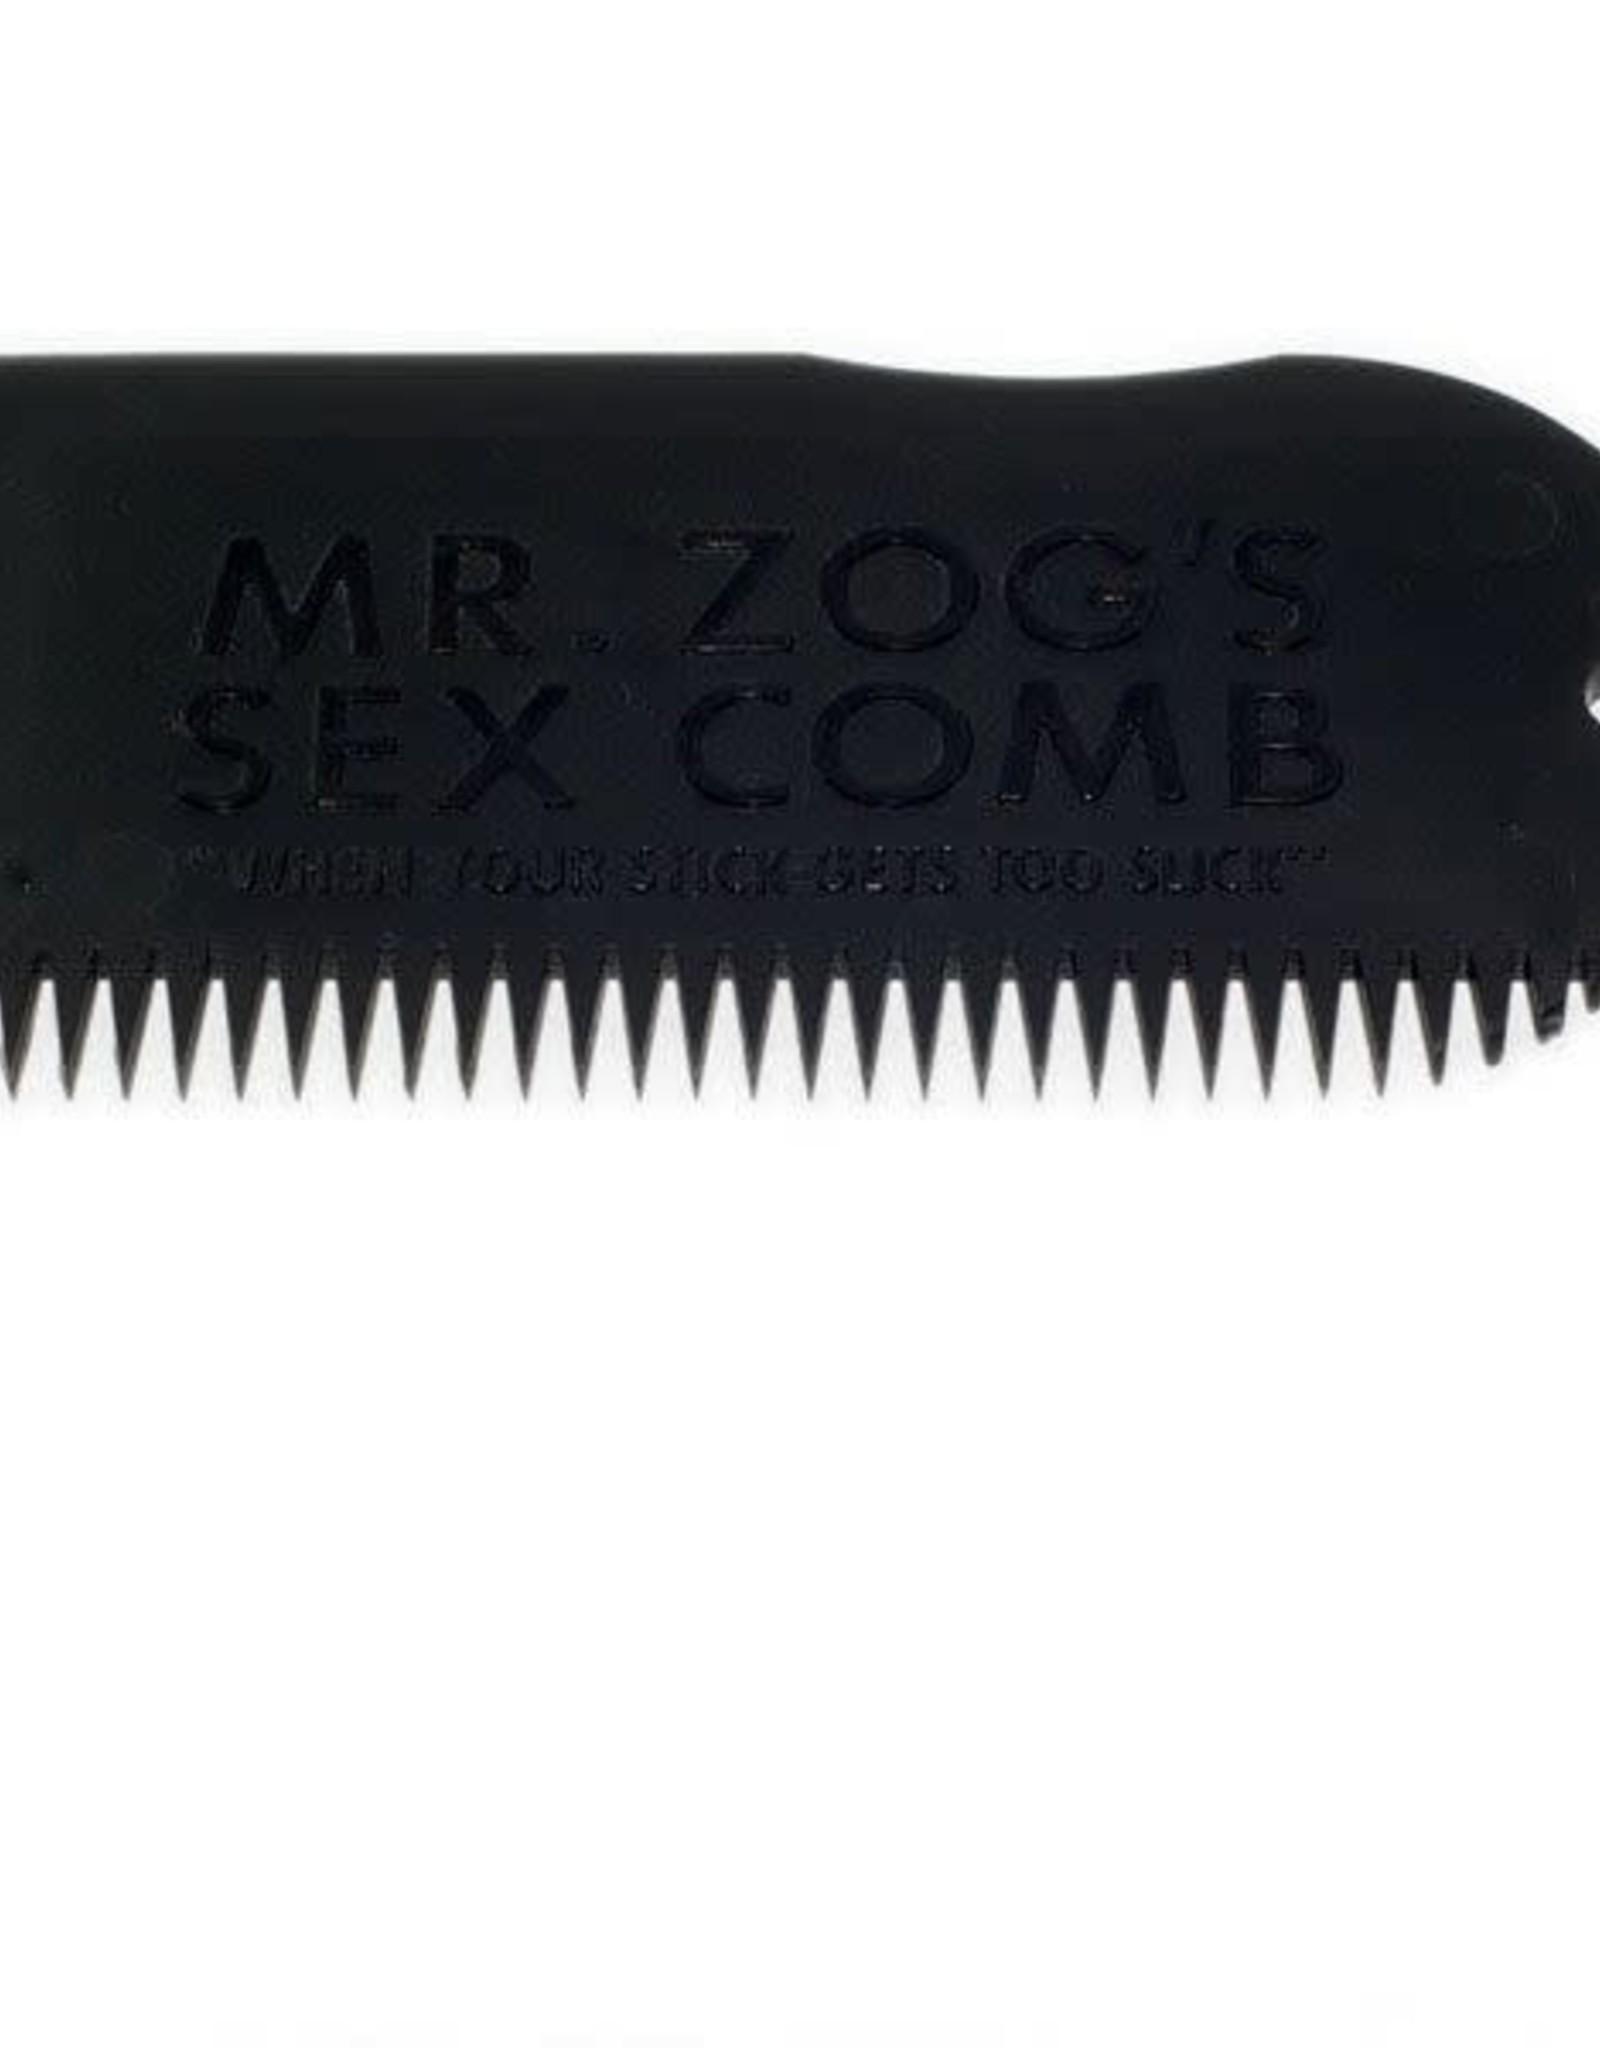 Sexwax Sexwax Comb